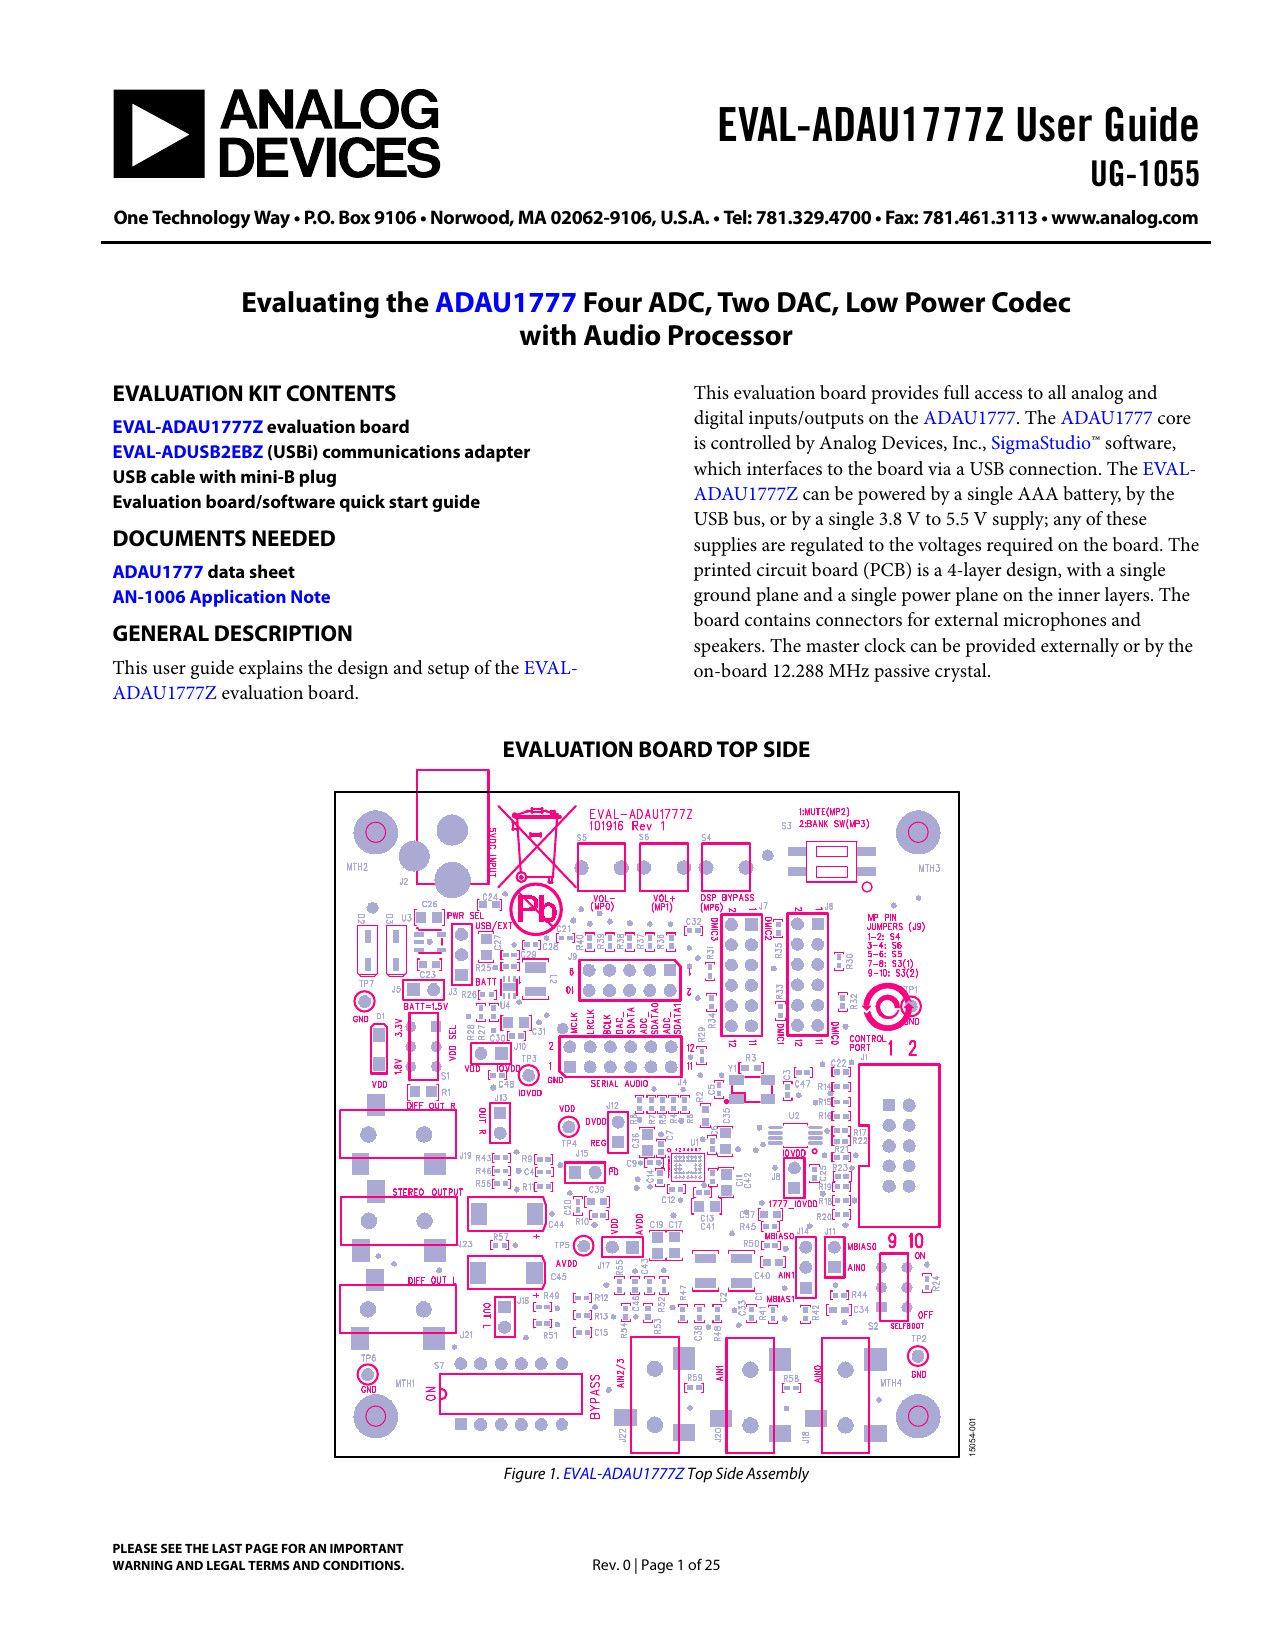 5 Blank Clock Worksheet Readingog Clocks 001 Eval